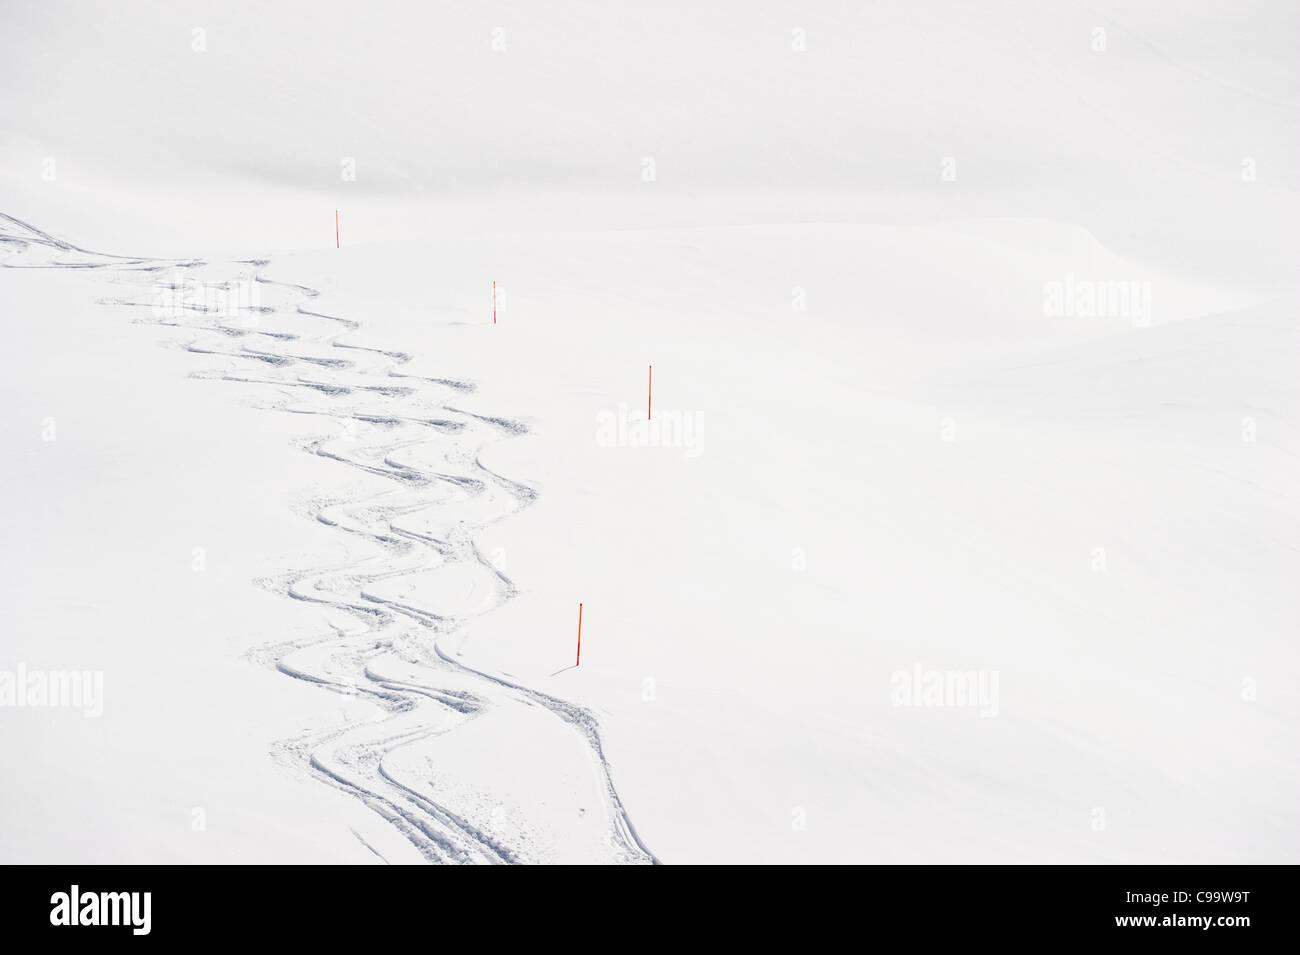 Austria, Zurs, Lech, View of ski tracks in snow - Stock Image